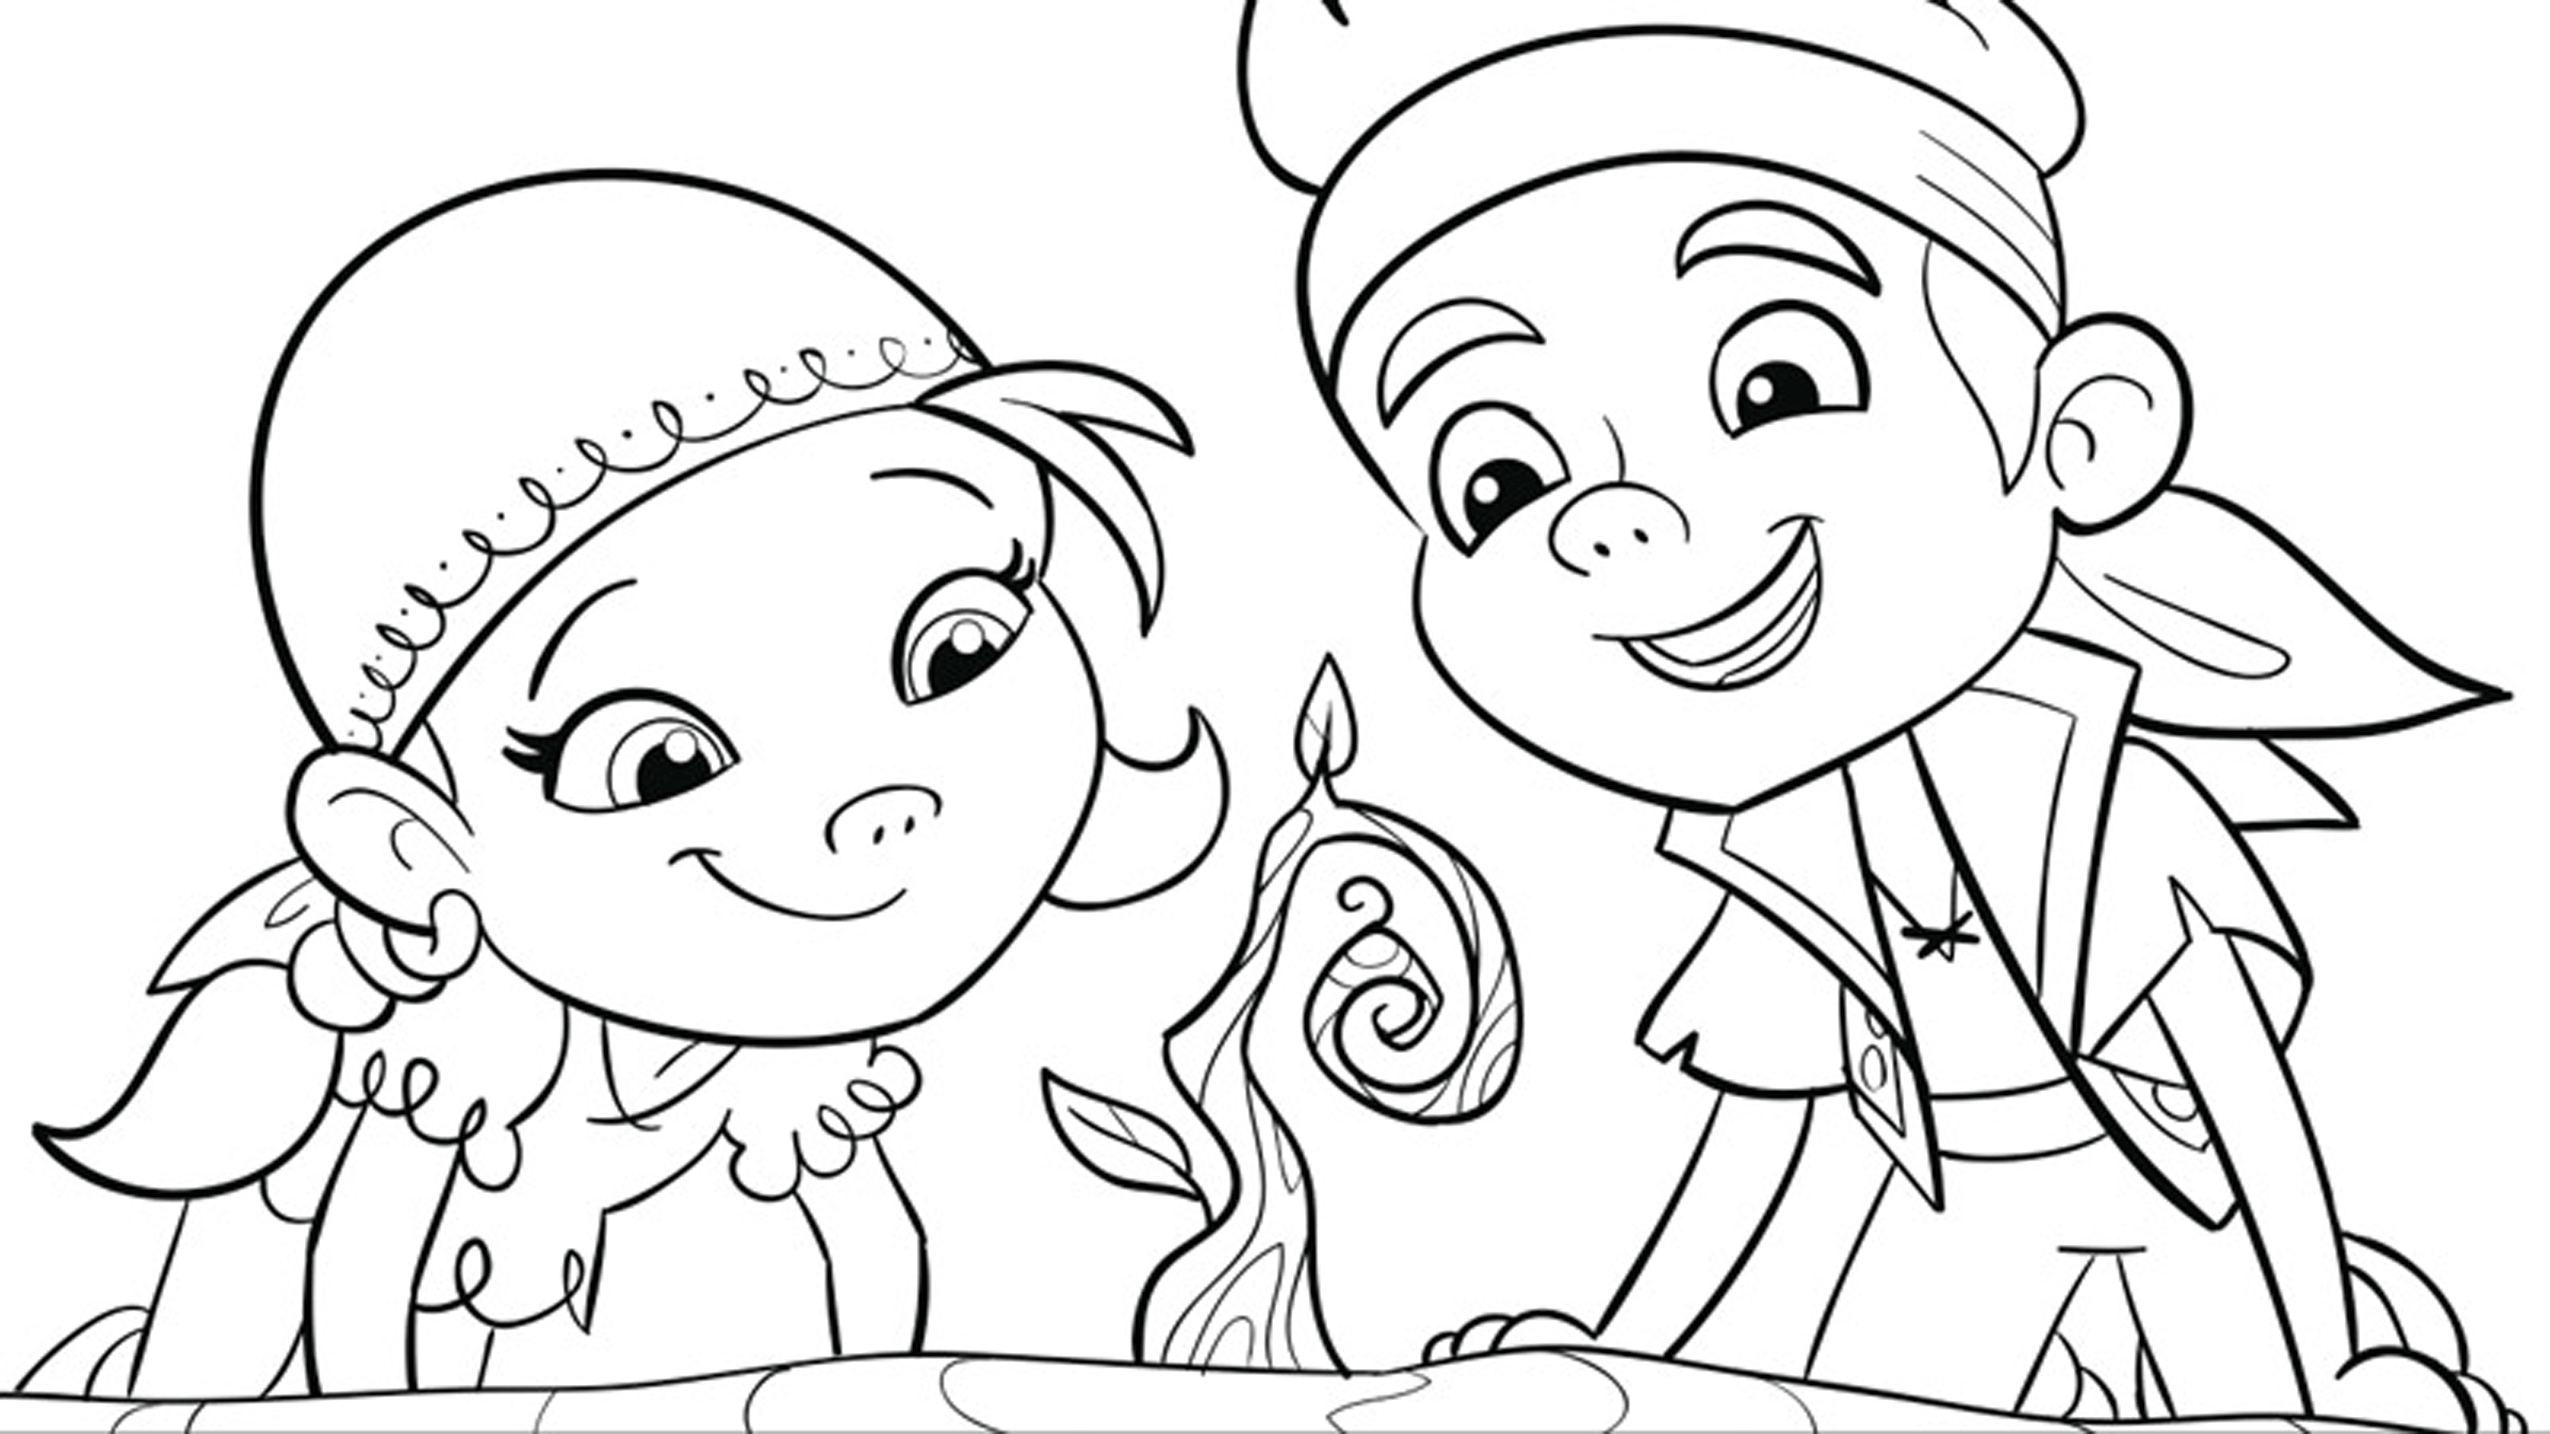 2550x1434 disney printables coloring pages disney printable coloring pages - Free Childrens Coloring Printouts